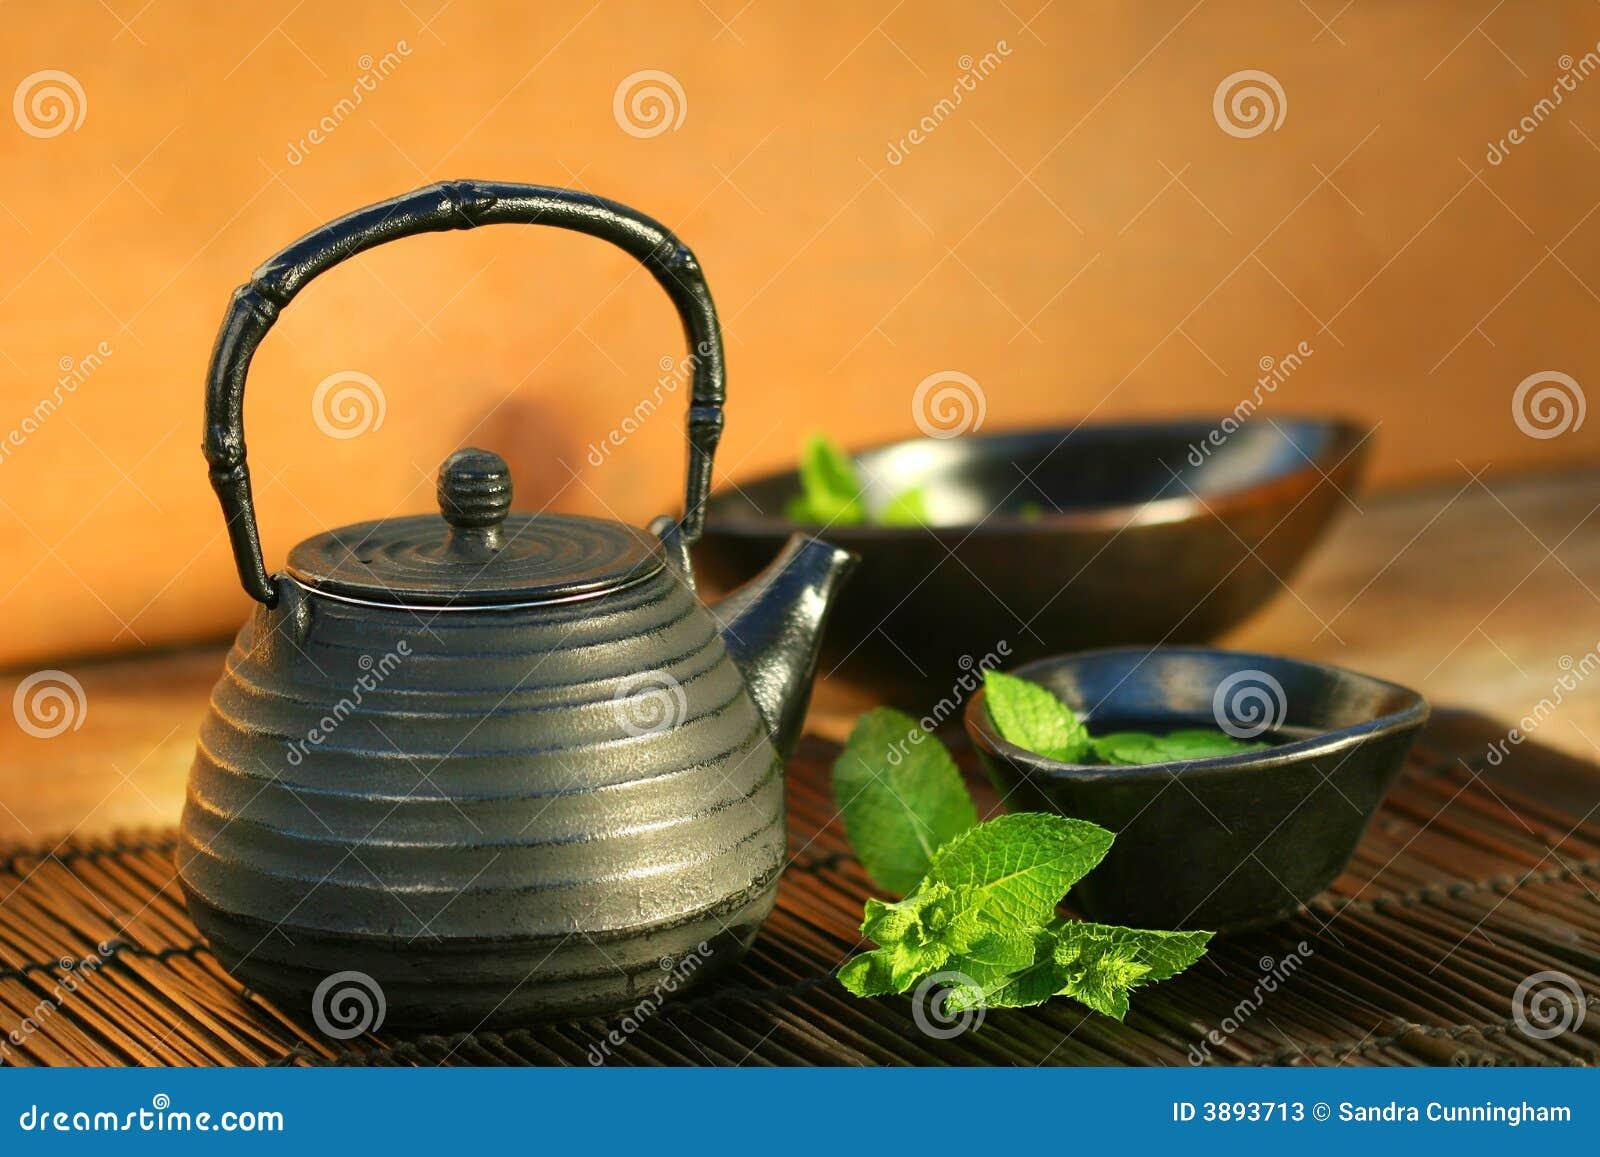 Teiera e tazza giapponesi